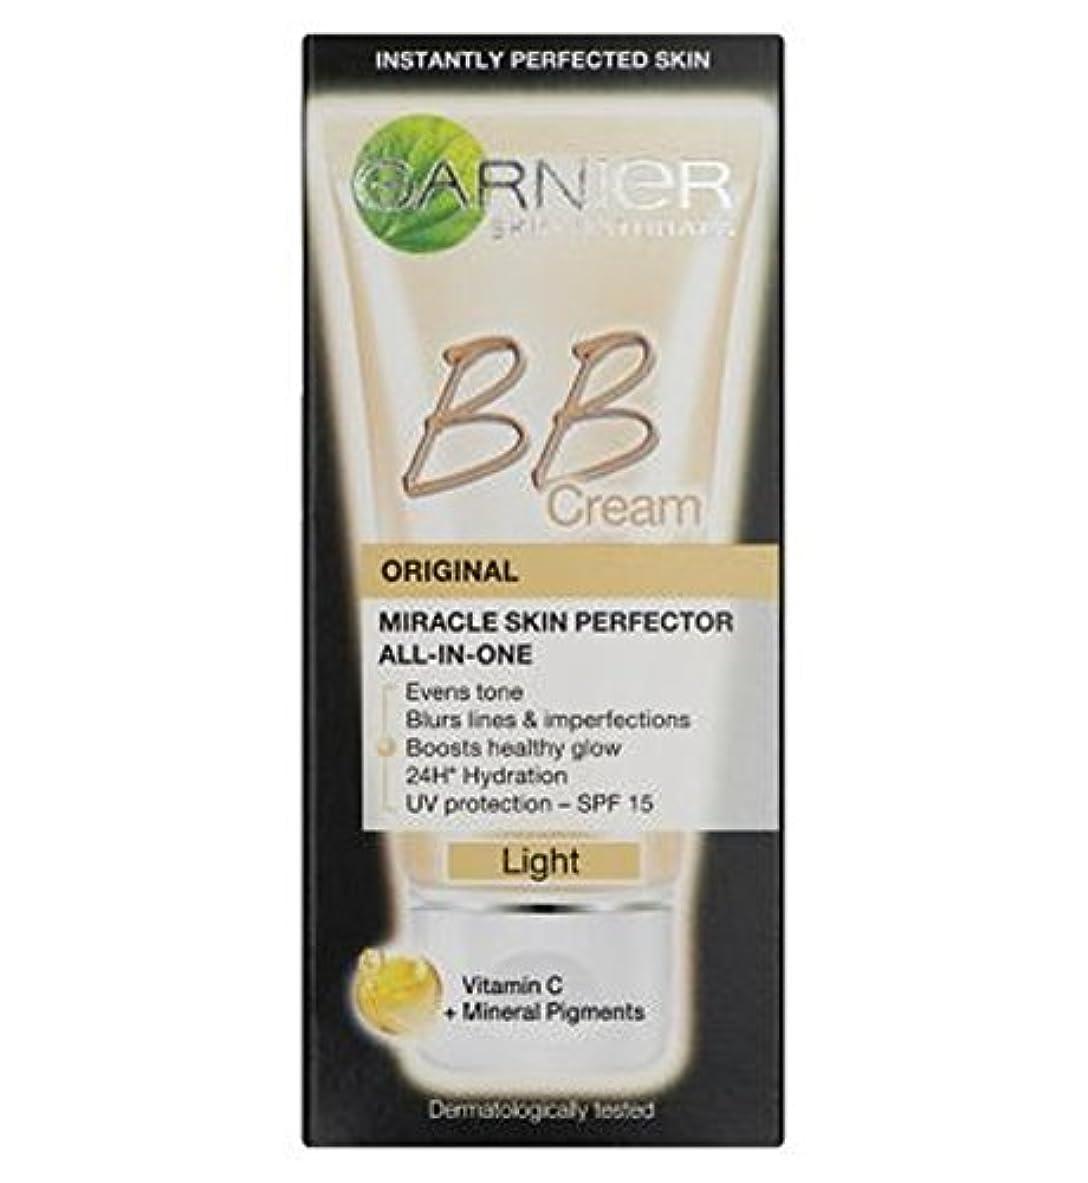 Garnier Skin Perfector Daily All-In-One B.B. Blemish Balm Cream Light 50ml - 毎日オールインワンB.B.ガルニエスキンパーフェク傷バームクリームライト...